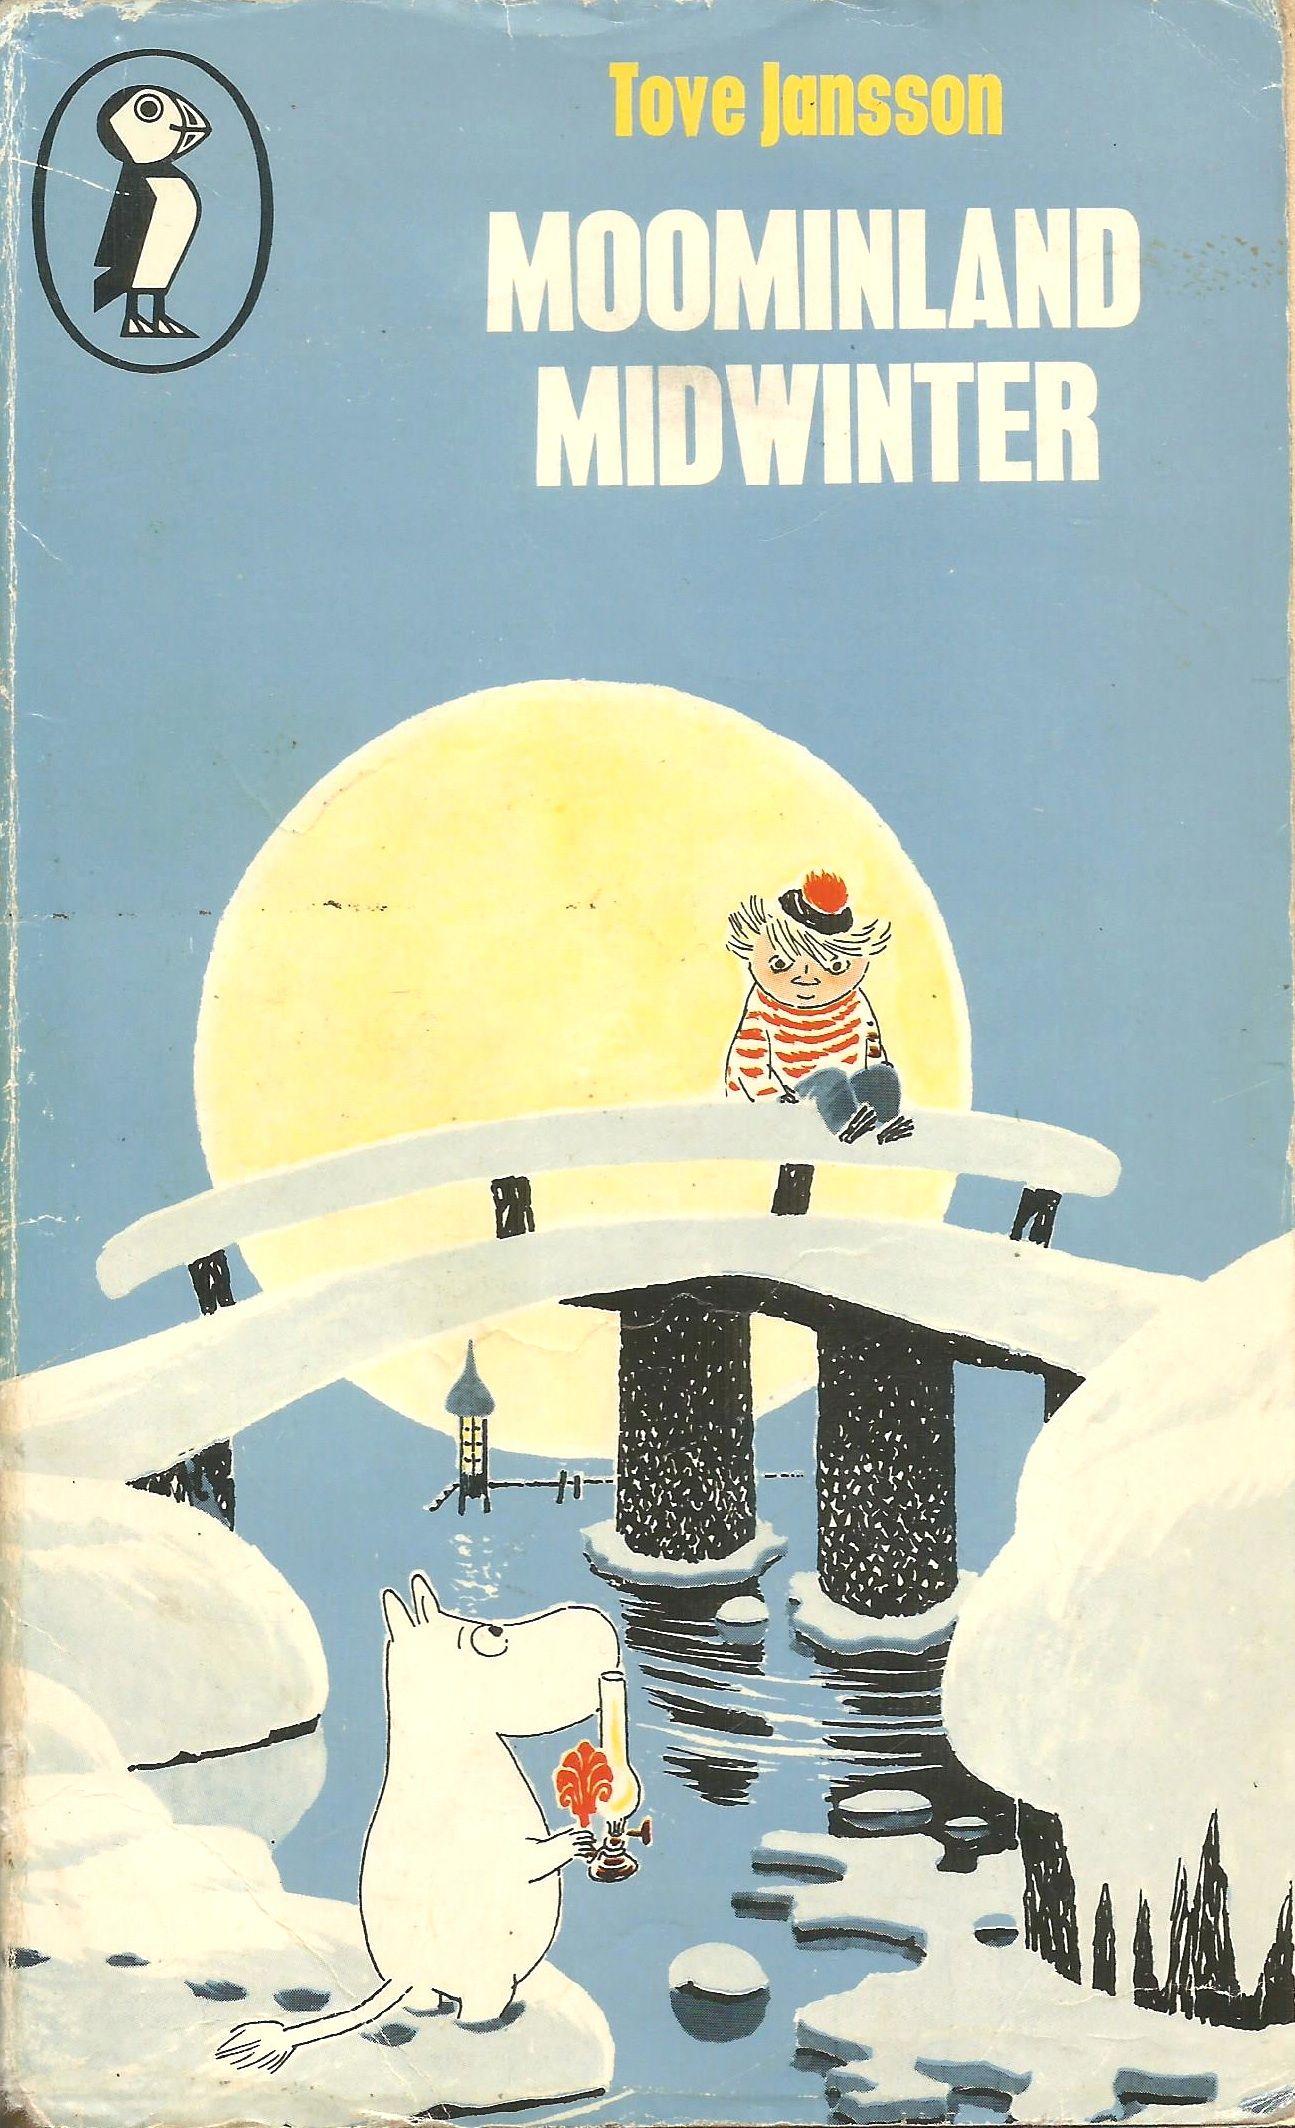 Moominland Midwinter - Tove Jansson -2.6.17-Enchanting. Scandinavian Petit Prince.